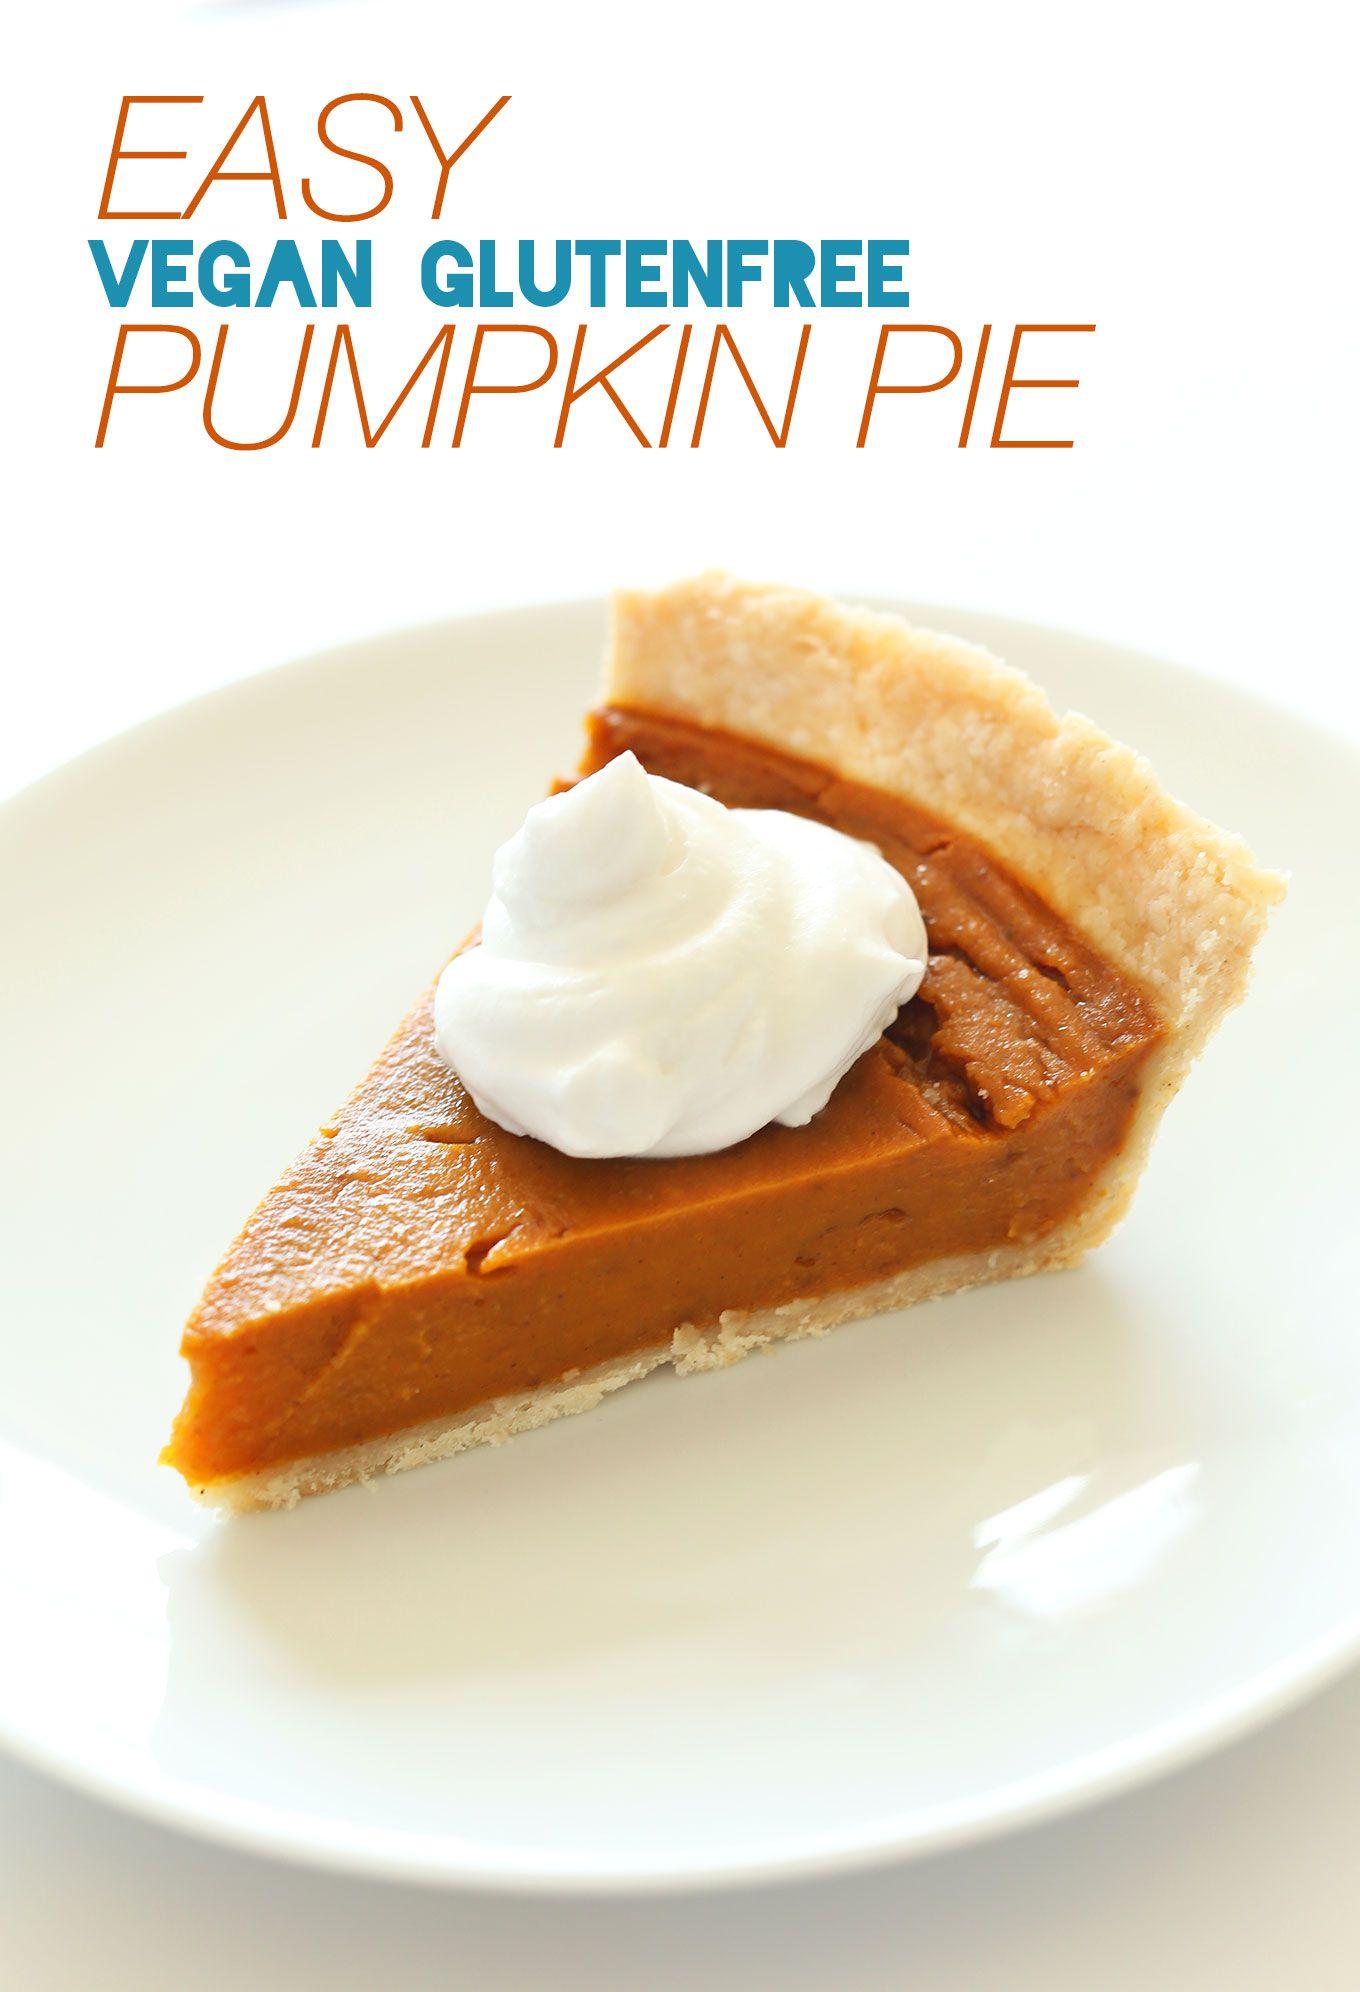 Vegan Gluten Free Pumpkin Pie Minimalist Baker Recipes Recipe Vegan Pumpkin Gluten Free Pumpkin Pie Gluten Free Pumpkin